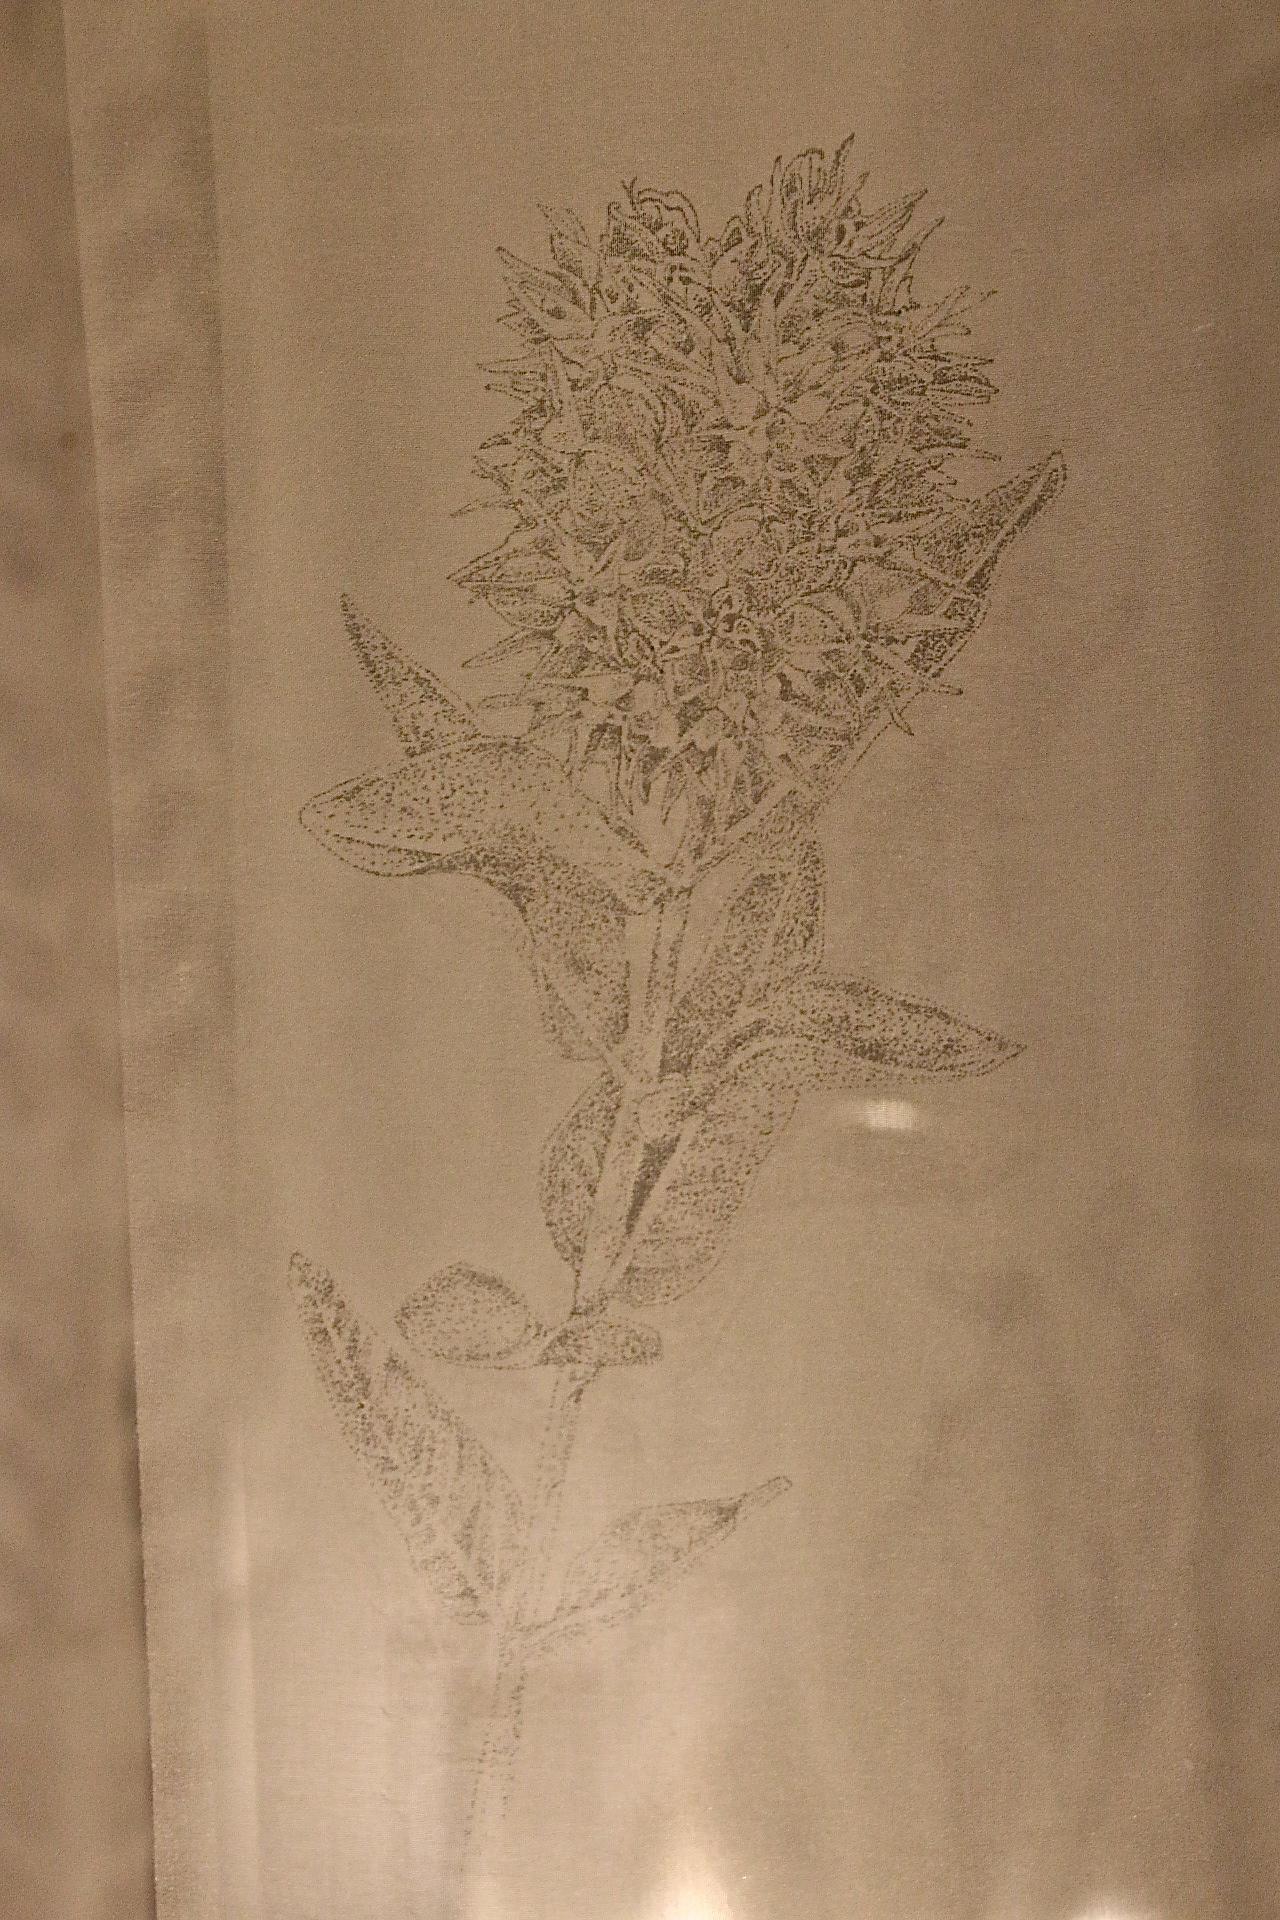 Milkweed.jpg